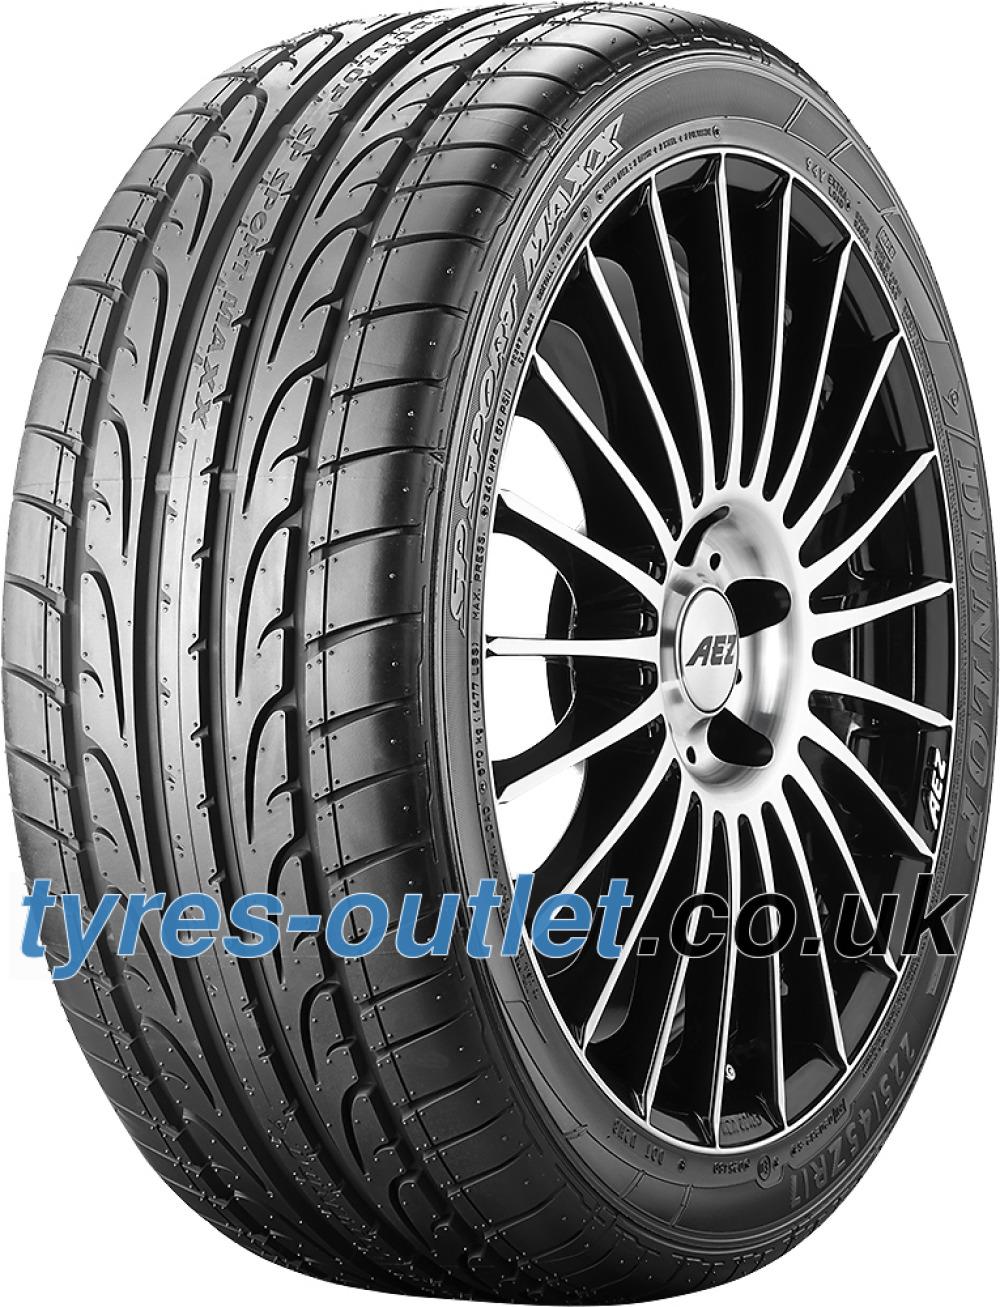 Dunlop SP Sport Maxx ( 305/30 ZR22 (105Y) XL with rim protection (MFS) )